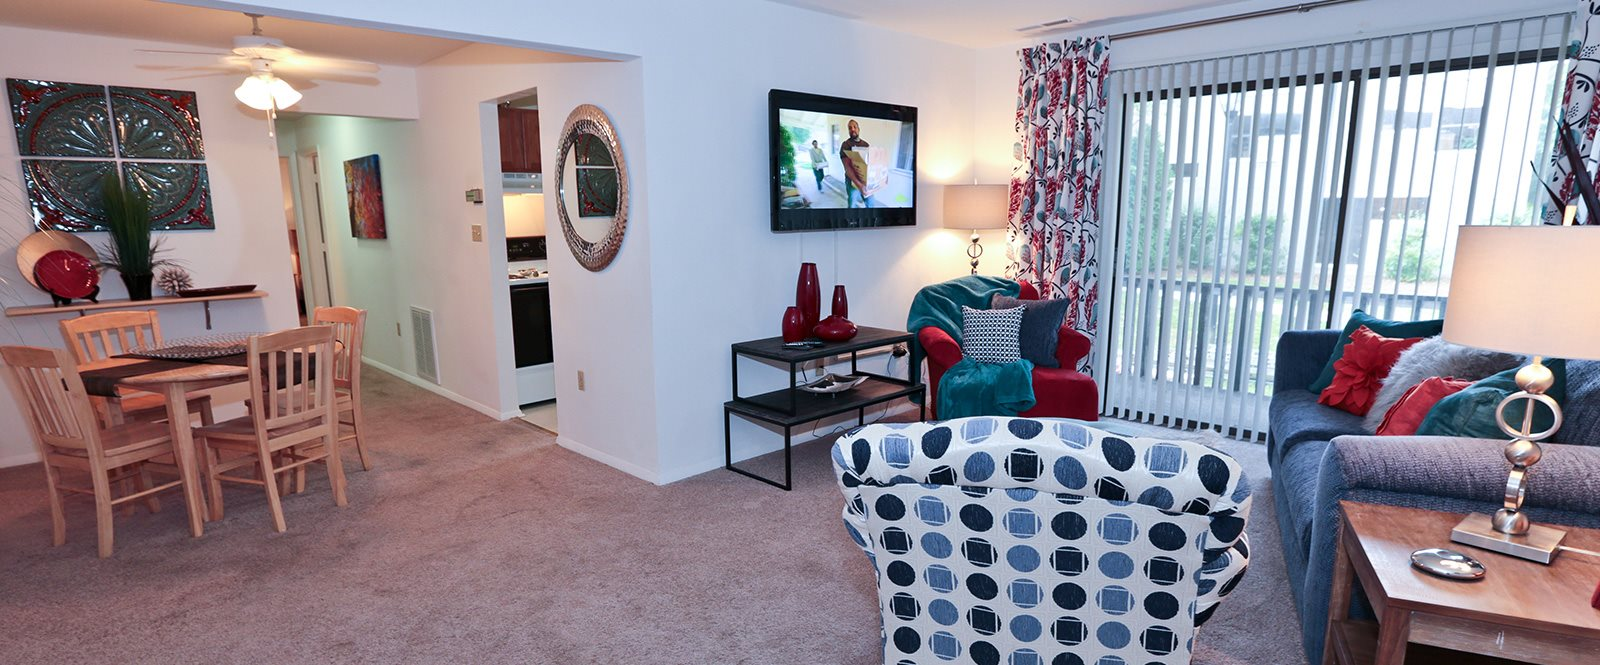 Garden Style Apartment Homes at Foxridge Apartment Homes, Blacksburg, VA